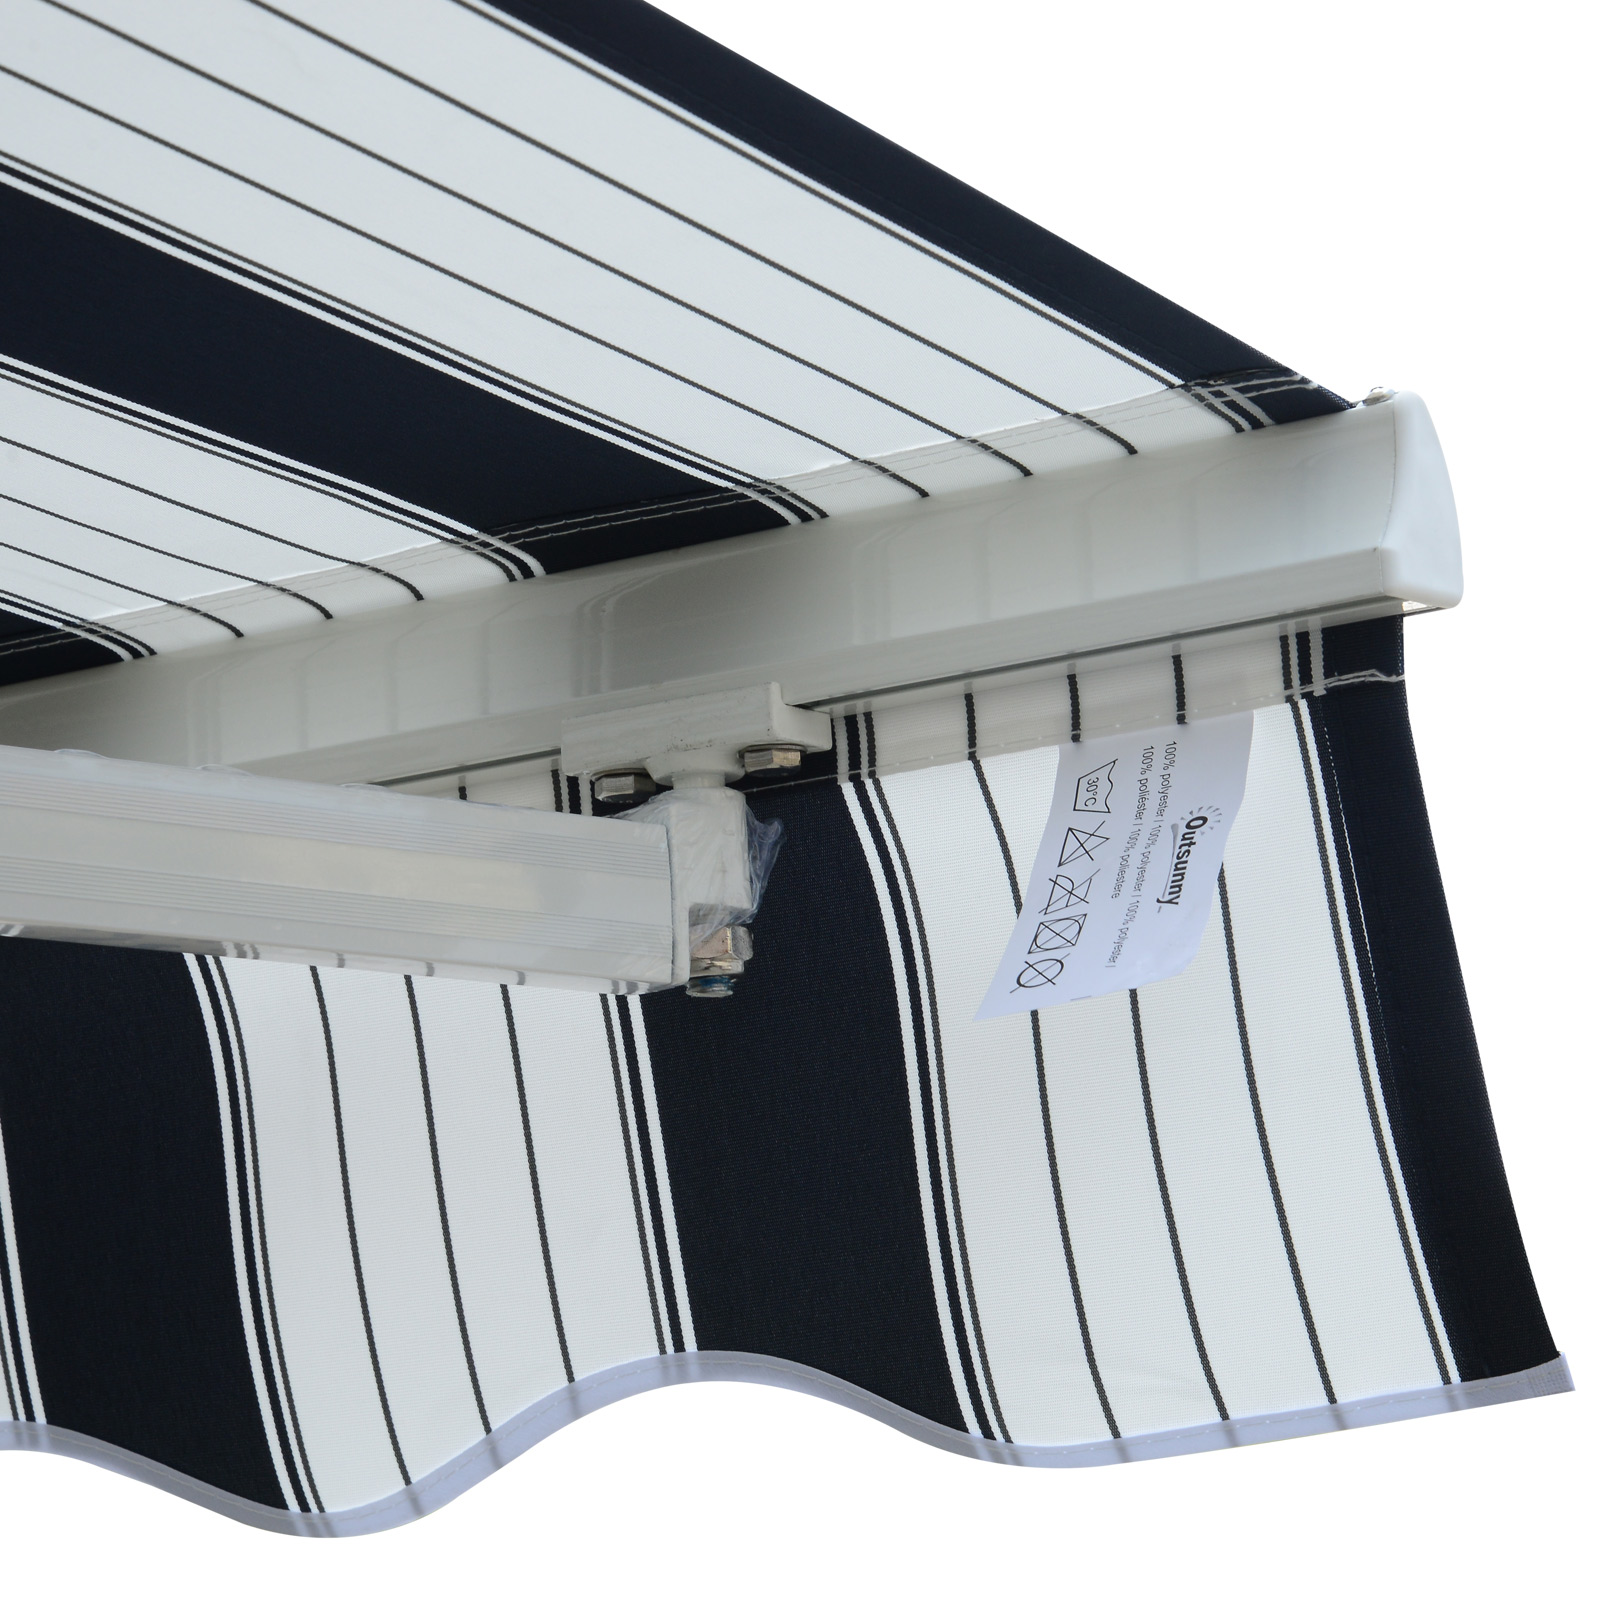 Garden-Patio-Manual-Awning-Canopy-Sun-Shade-Shelter-Retractable-4-Size-5-Colour thumbnail 8